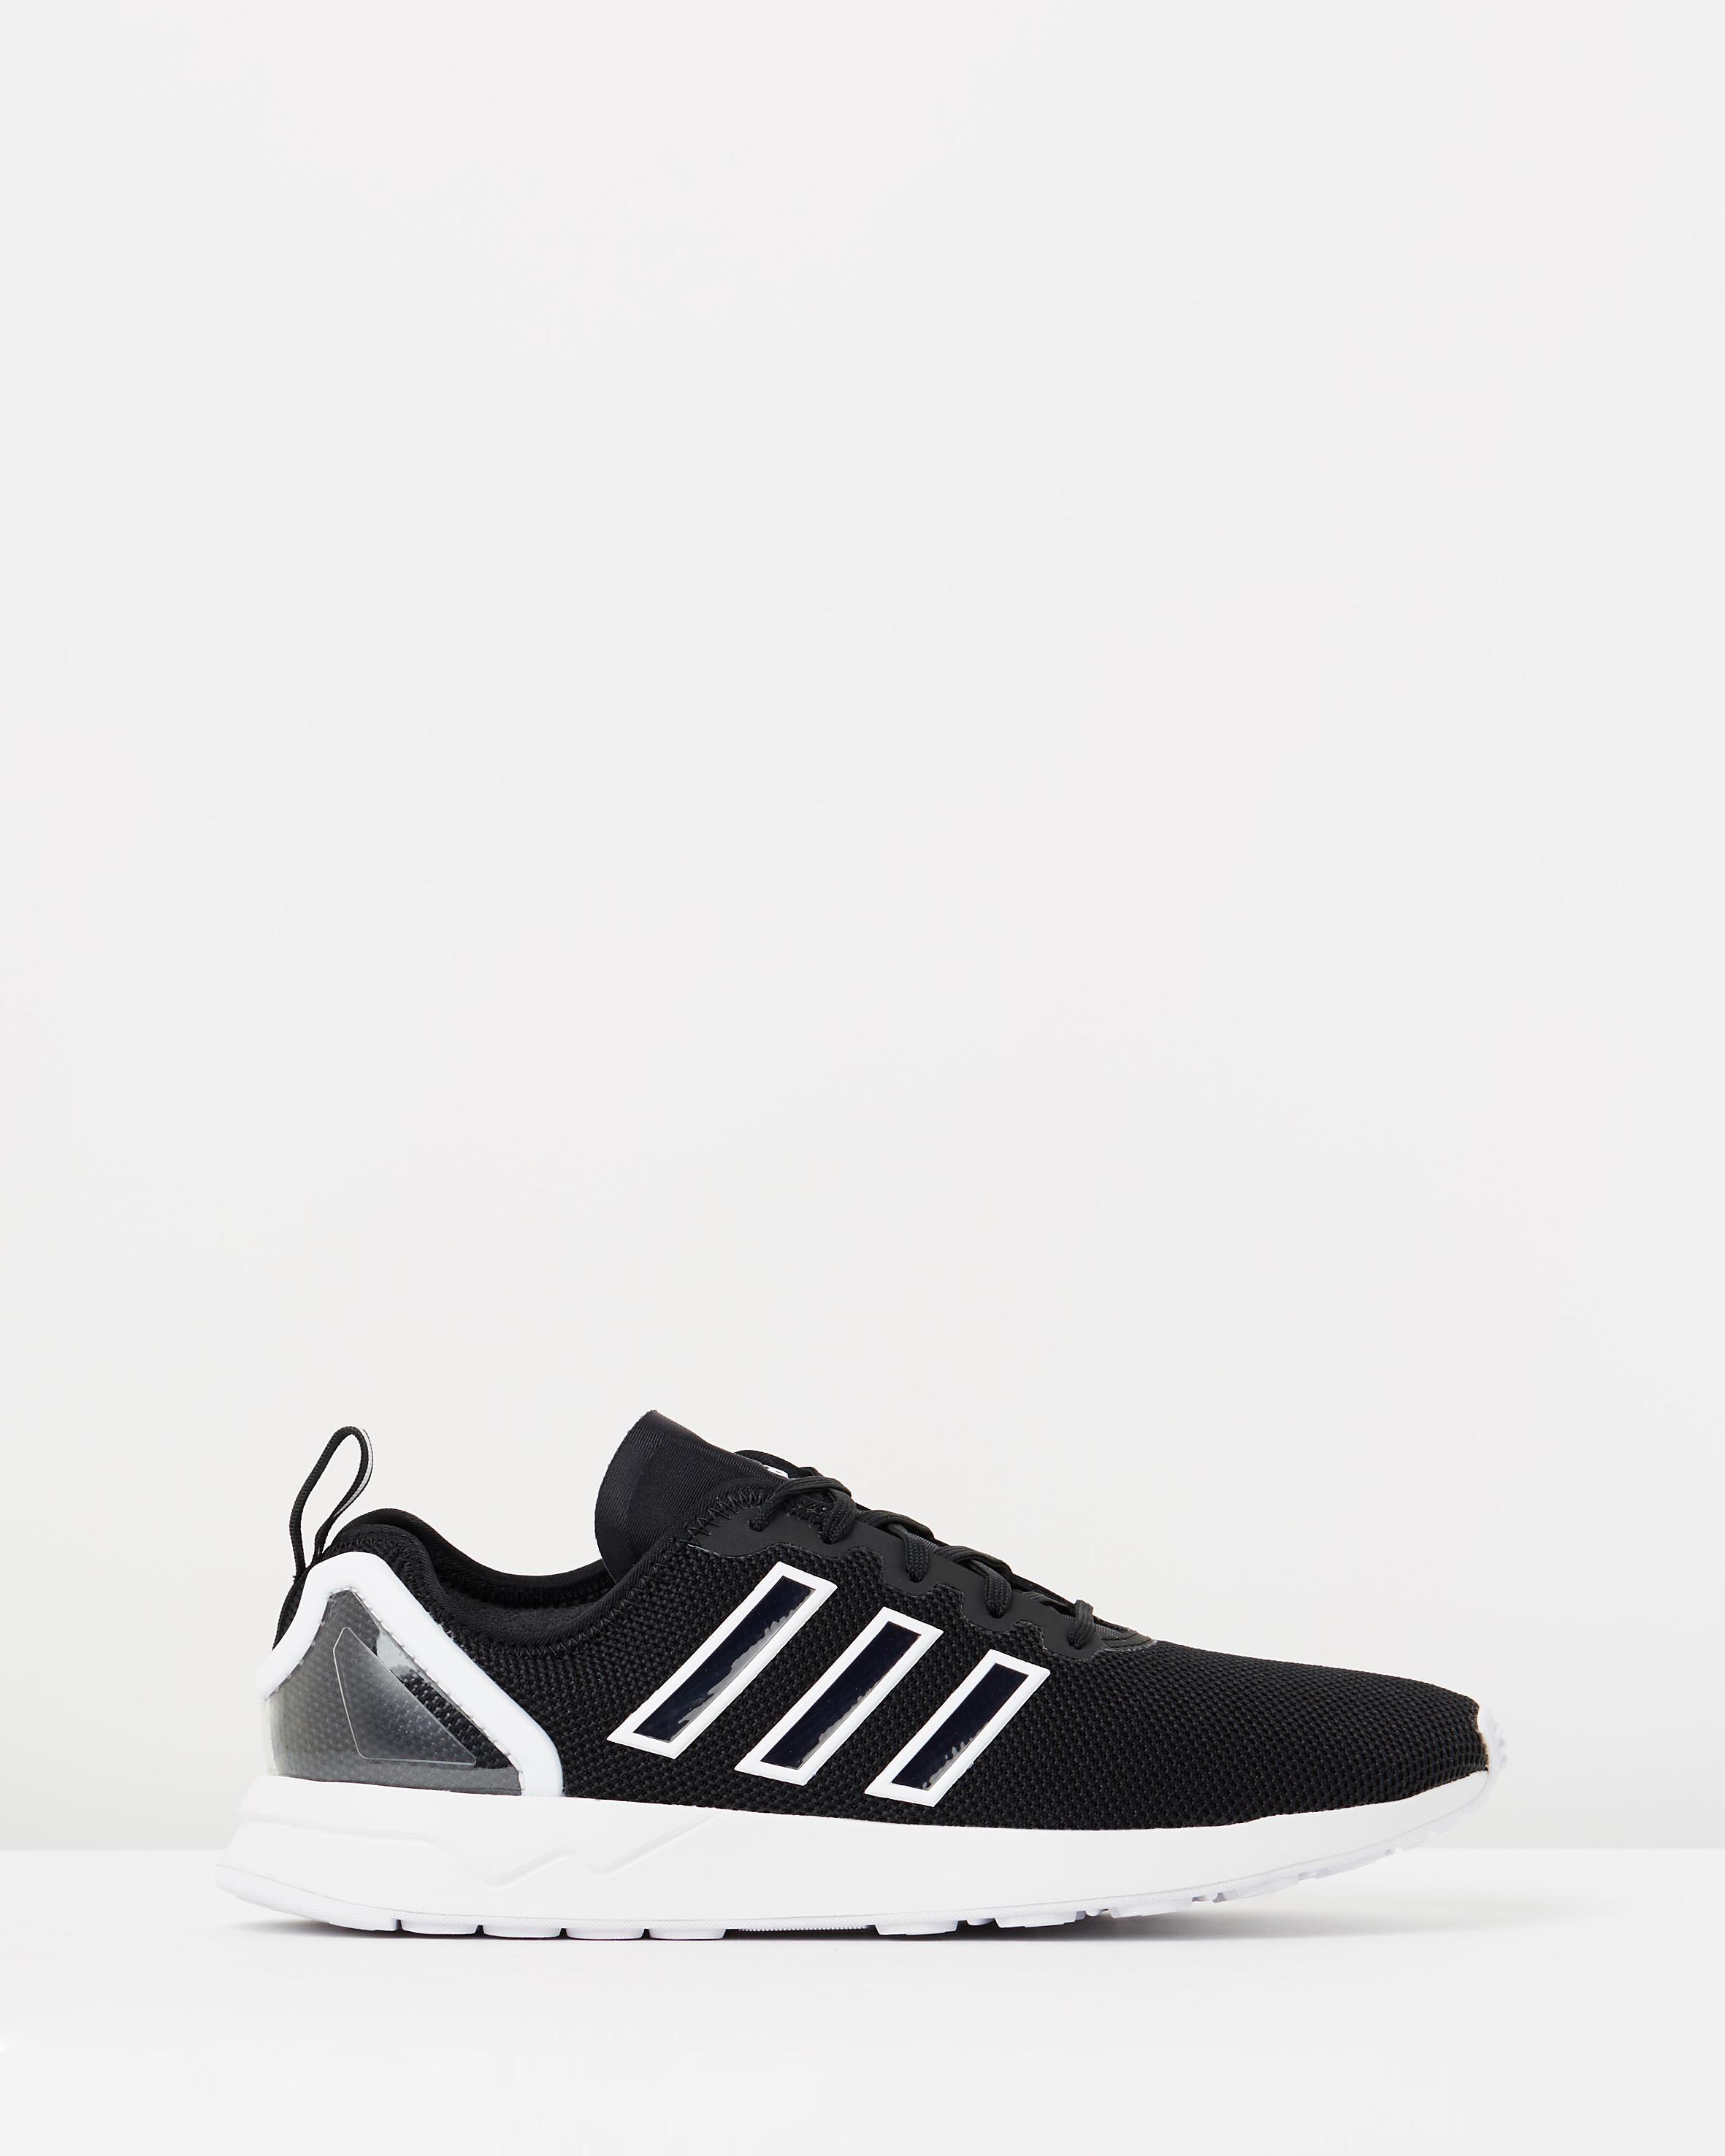 pretty nice 55a05 08a7b Adidas Women's ZX Flux ADV Virtue W, CORE BLACK